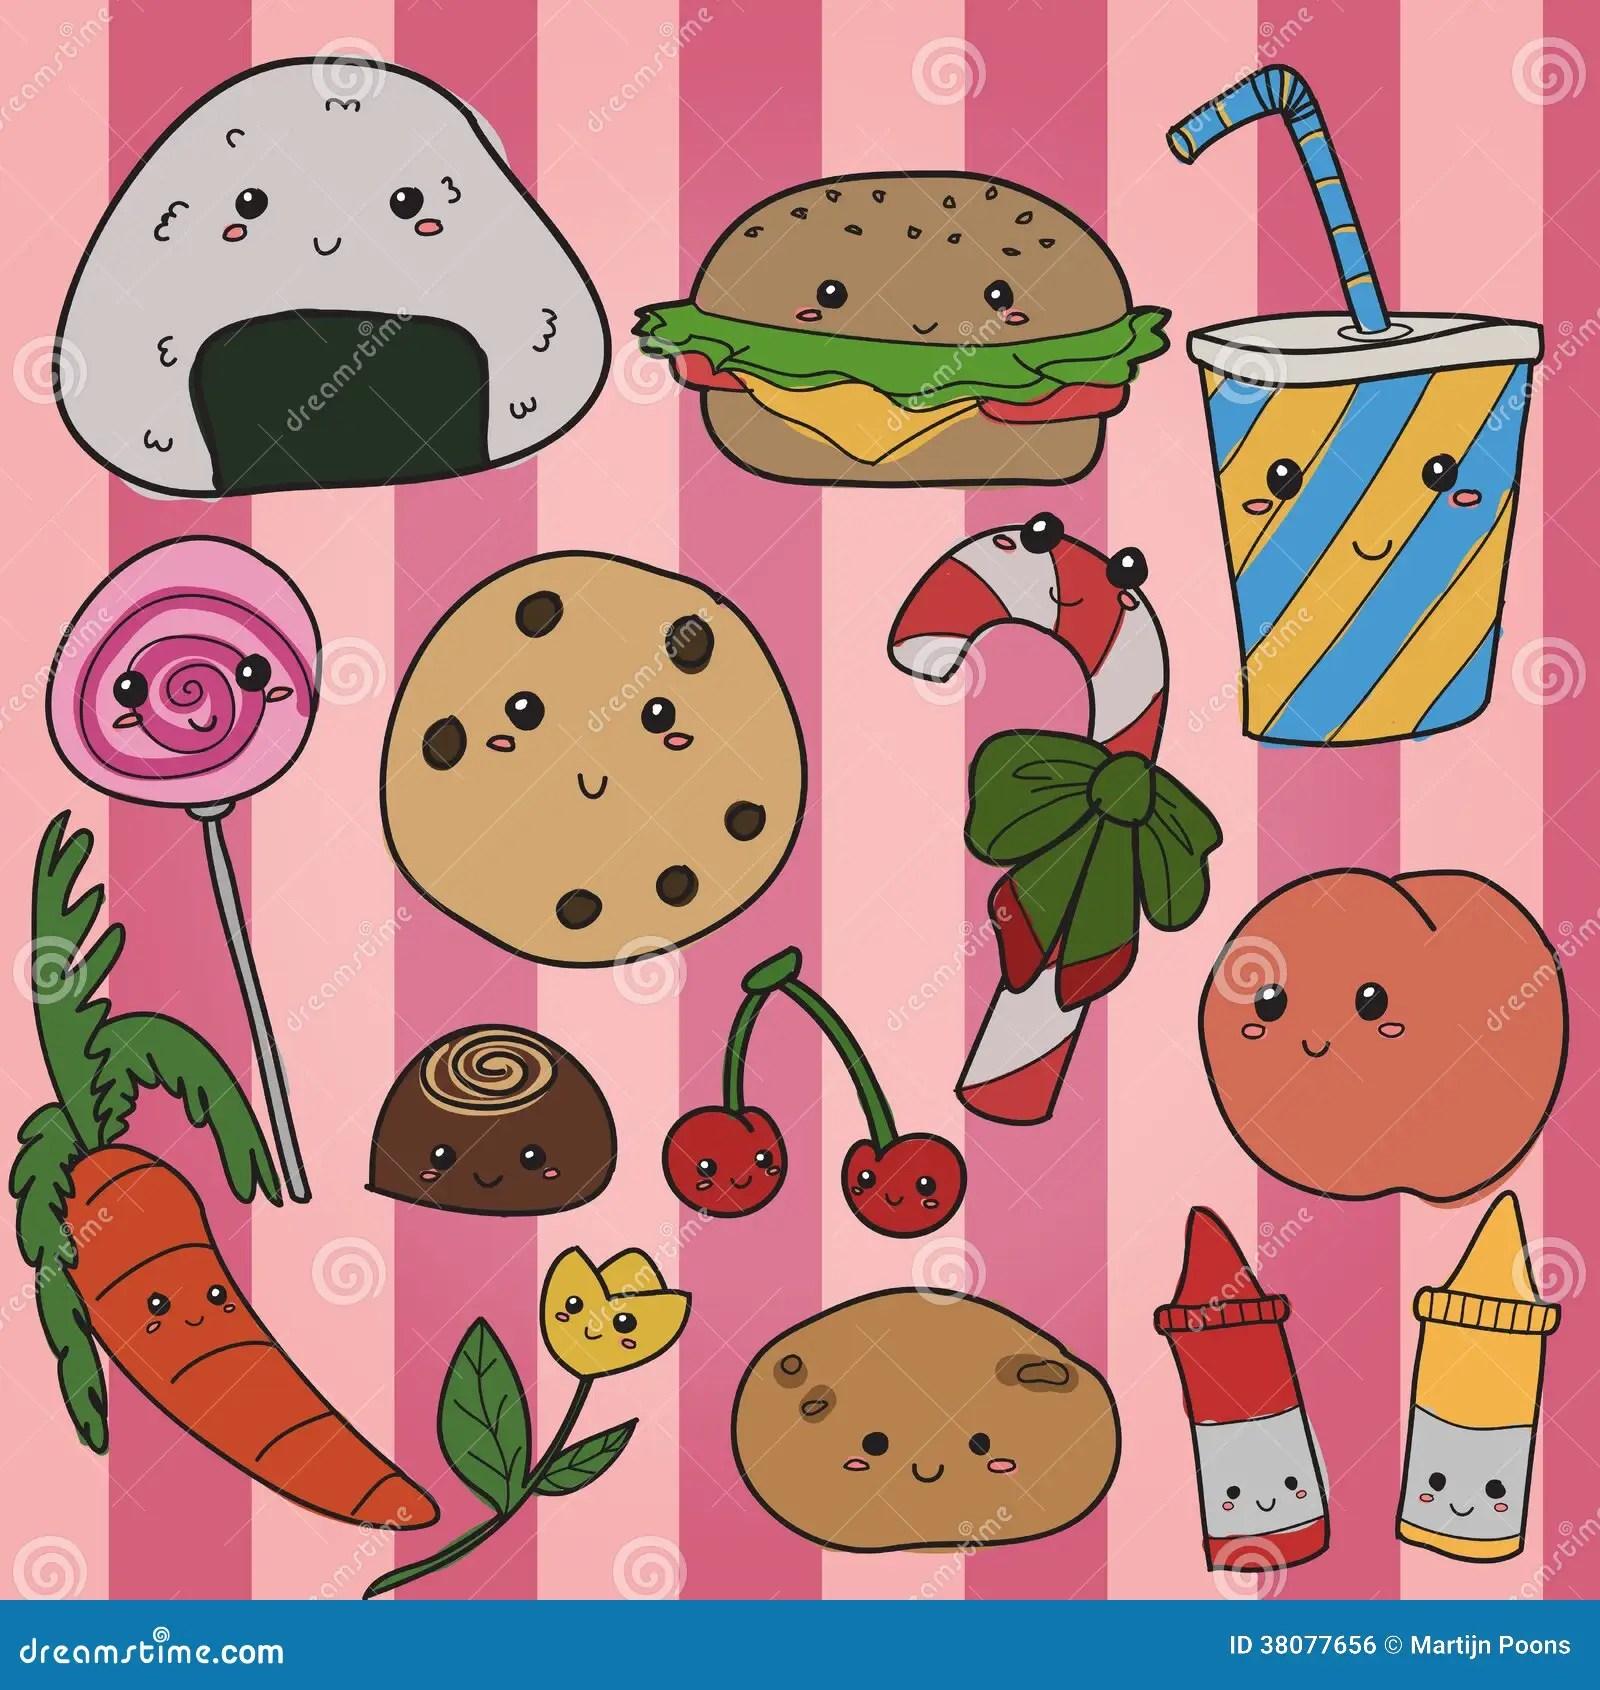 Pink Animal Print Wallpaper Kawaii Food Hand Drawn Stock Vector Image Of Mascot